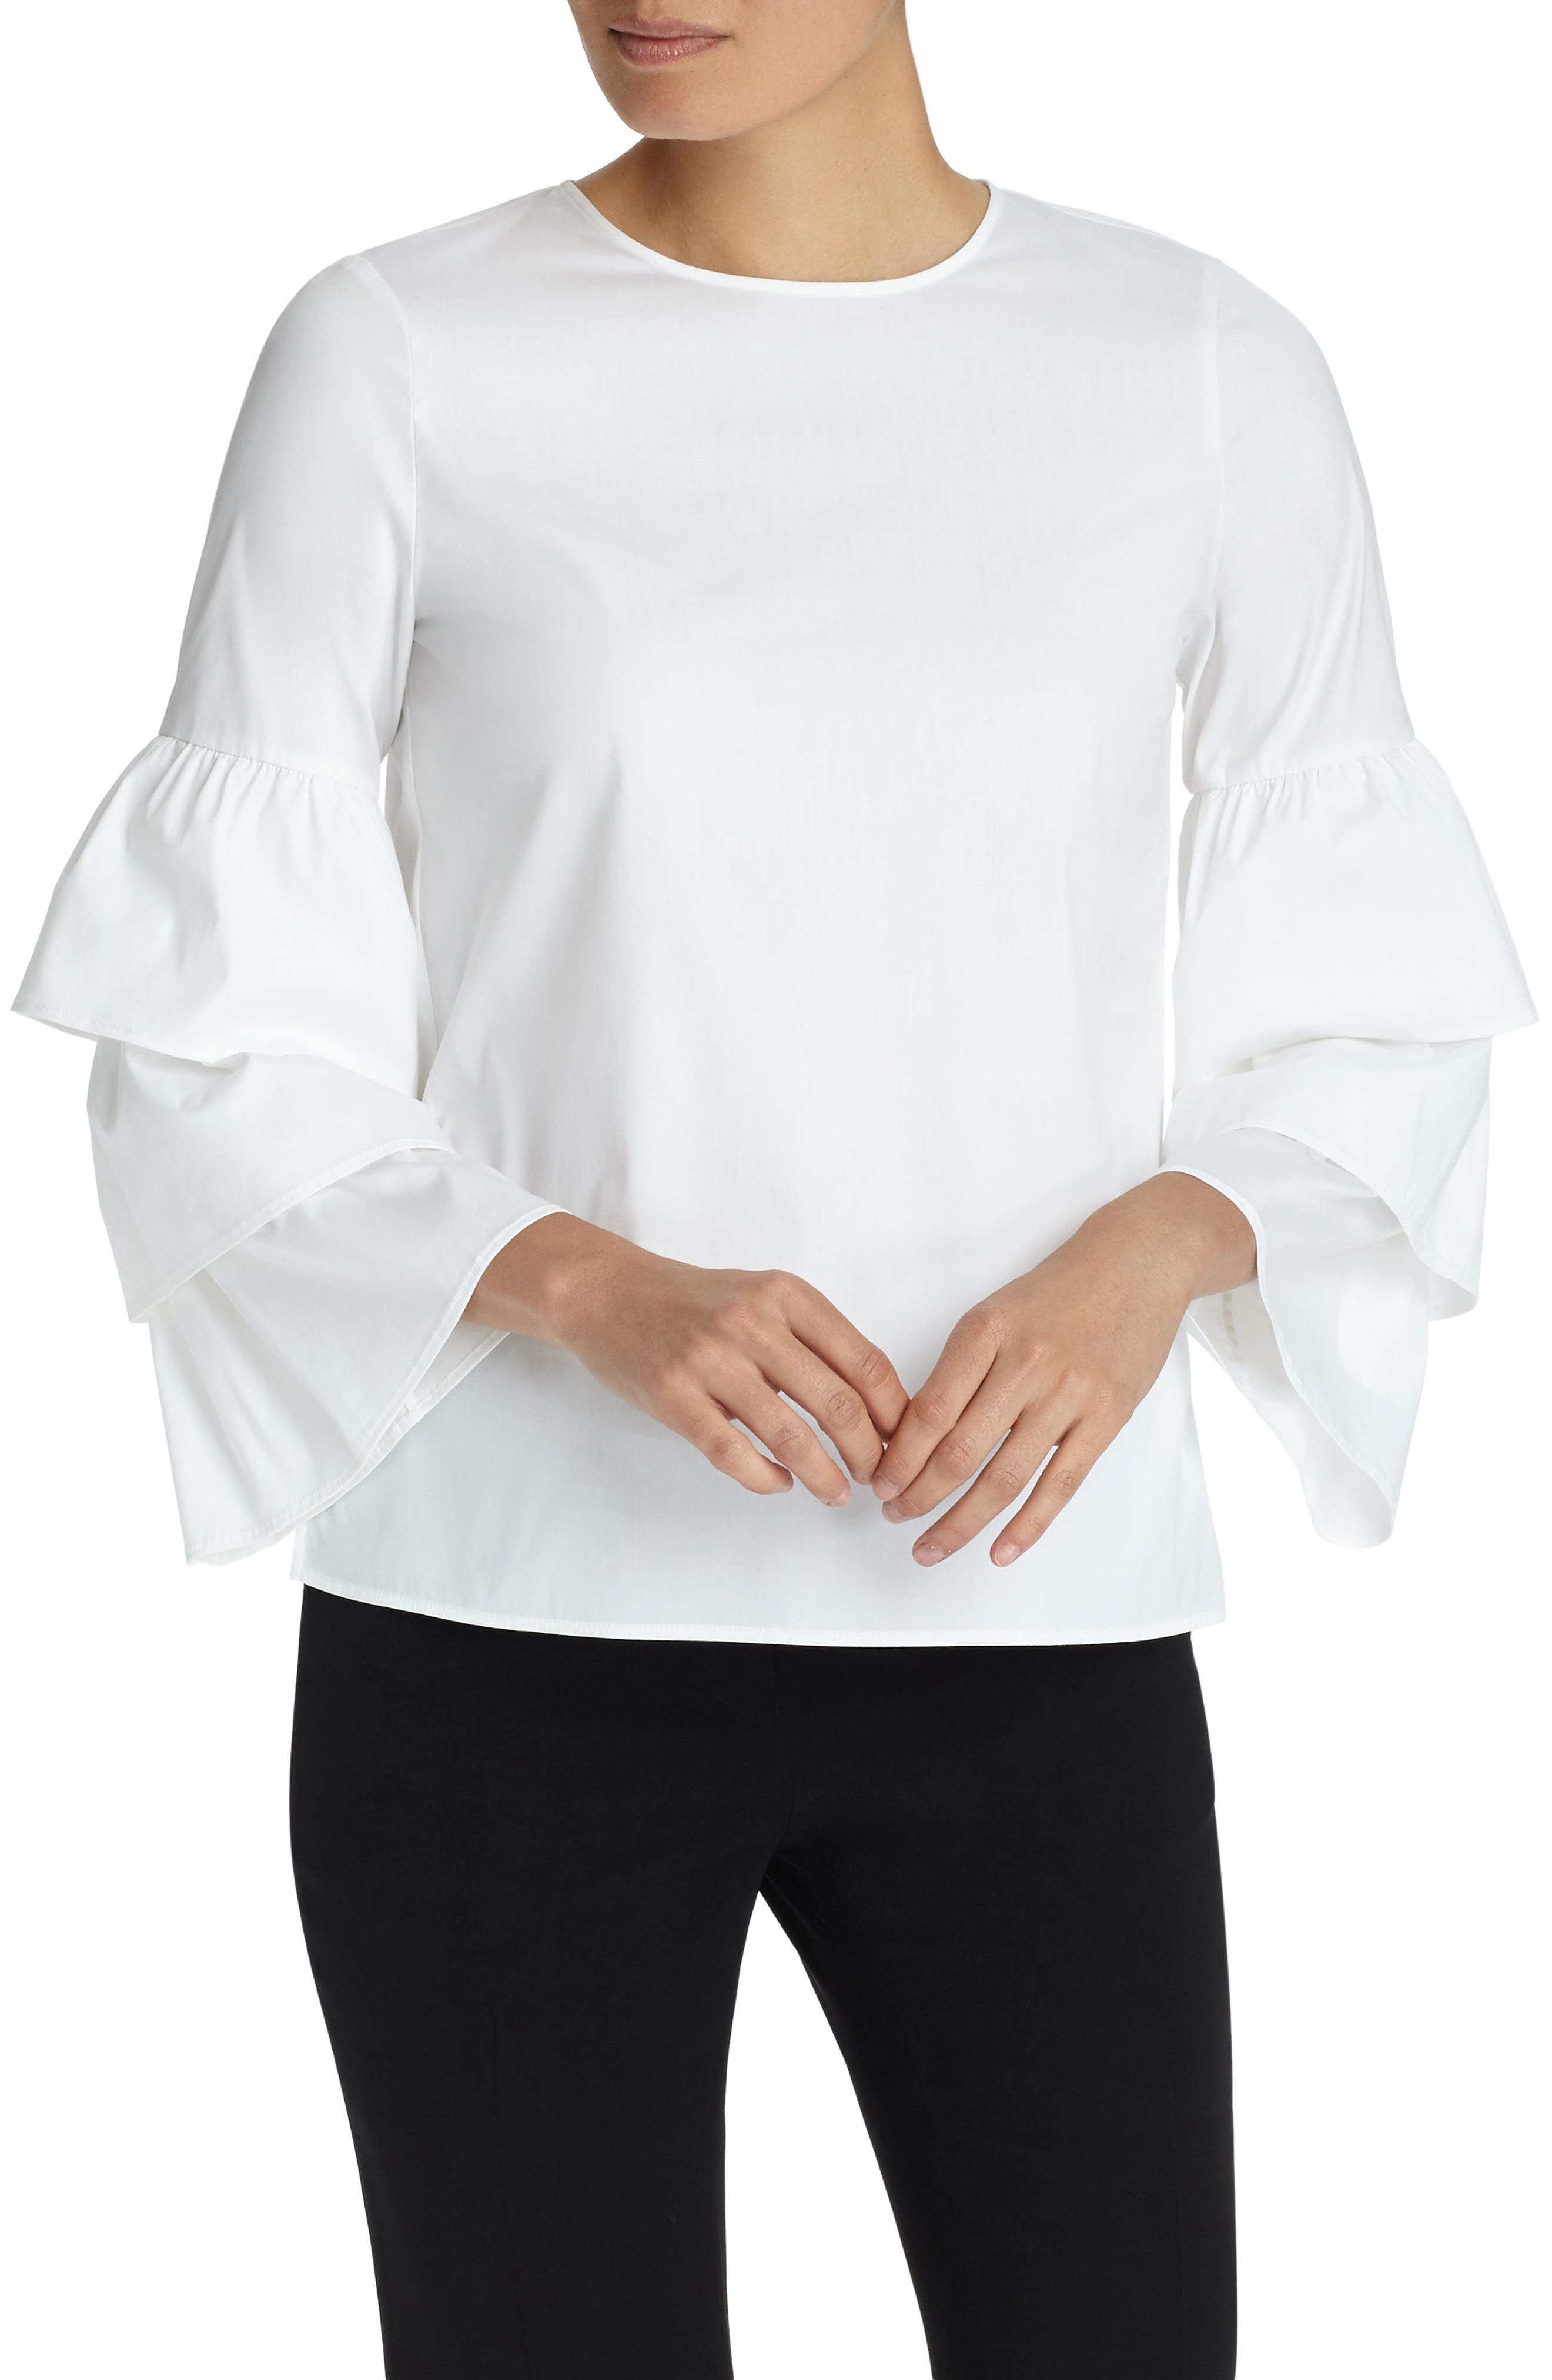 Main Image - Lafayette 148 New York Revina Stretch Cotton Blend Blouse